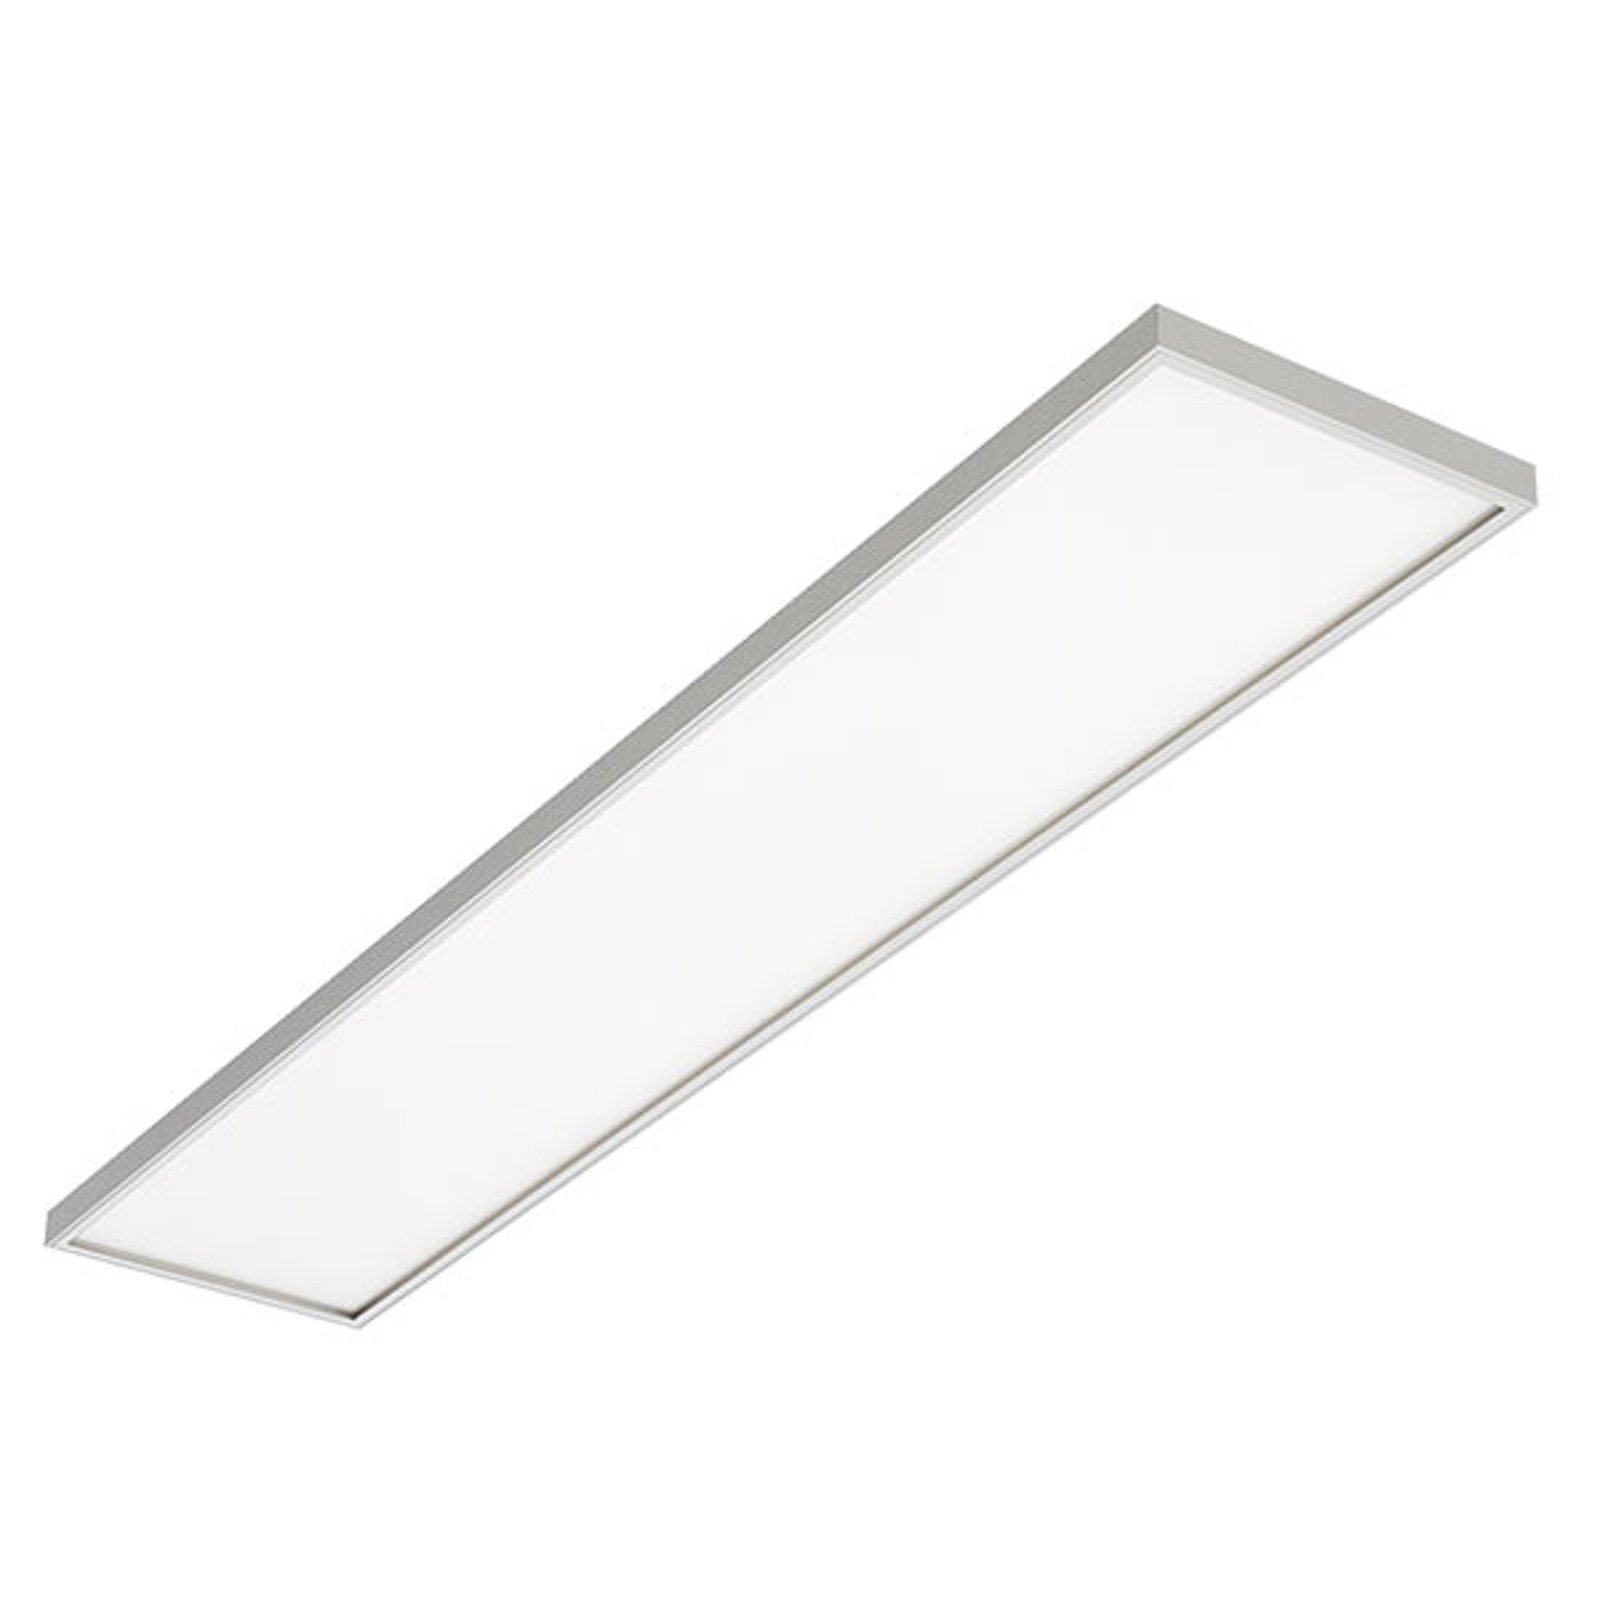 LED-kattovalaisin C95-S 4000 HF Mikroprisma